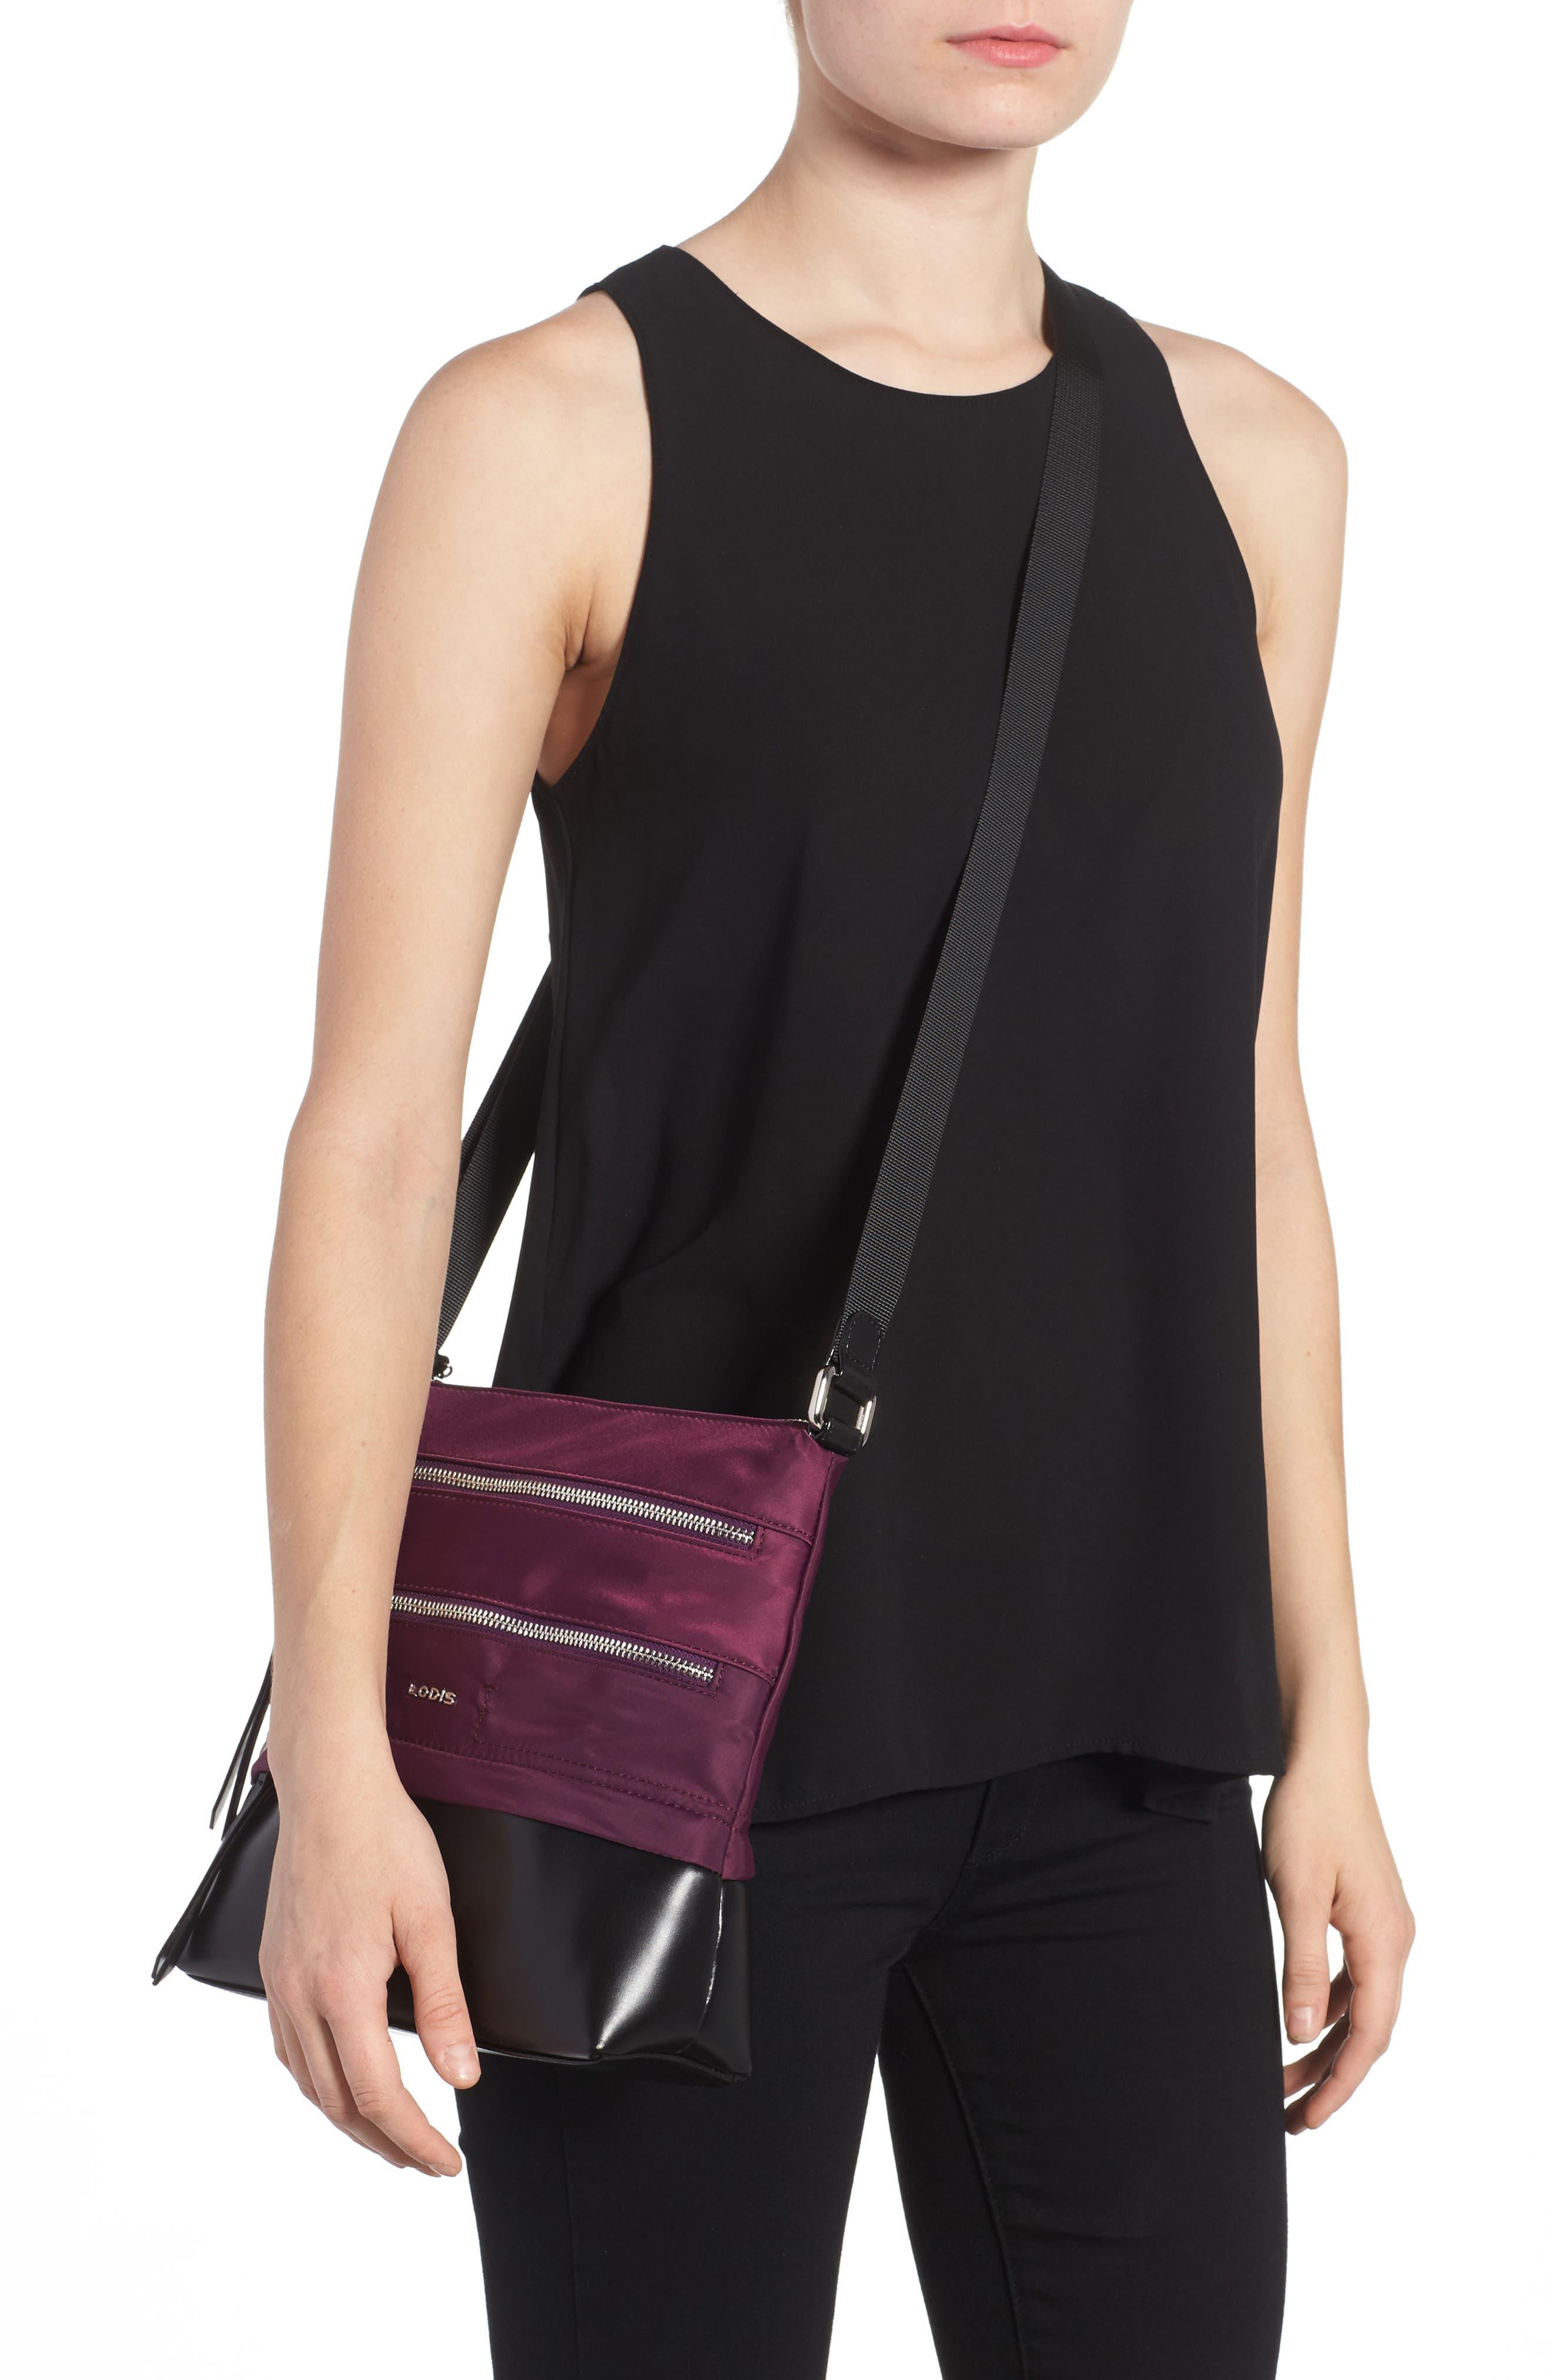 Wanda RFID Nylon & Leather Crossbody Bag,                             Alternate thumbnail 2, color,                             500